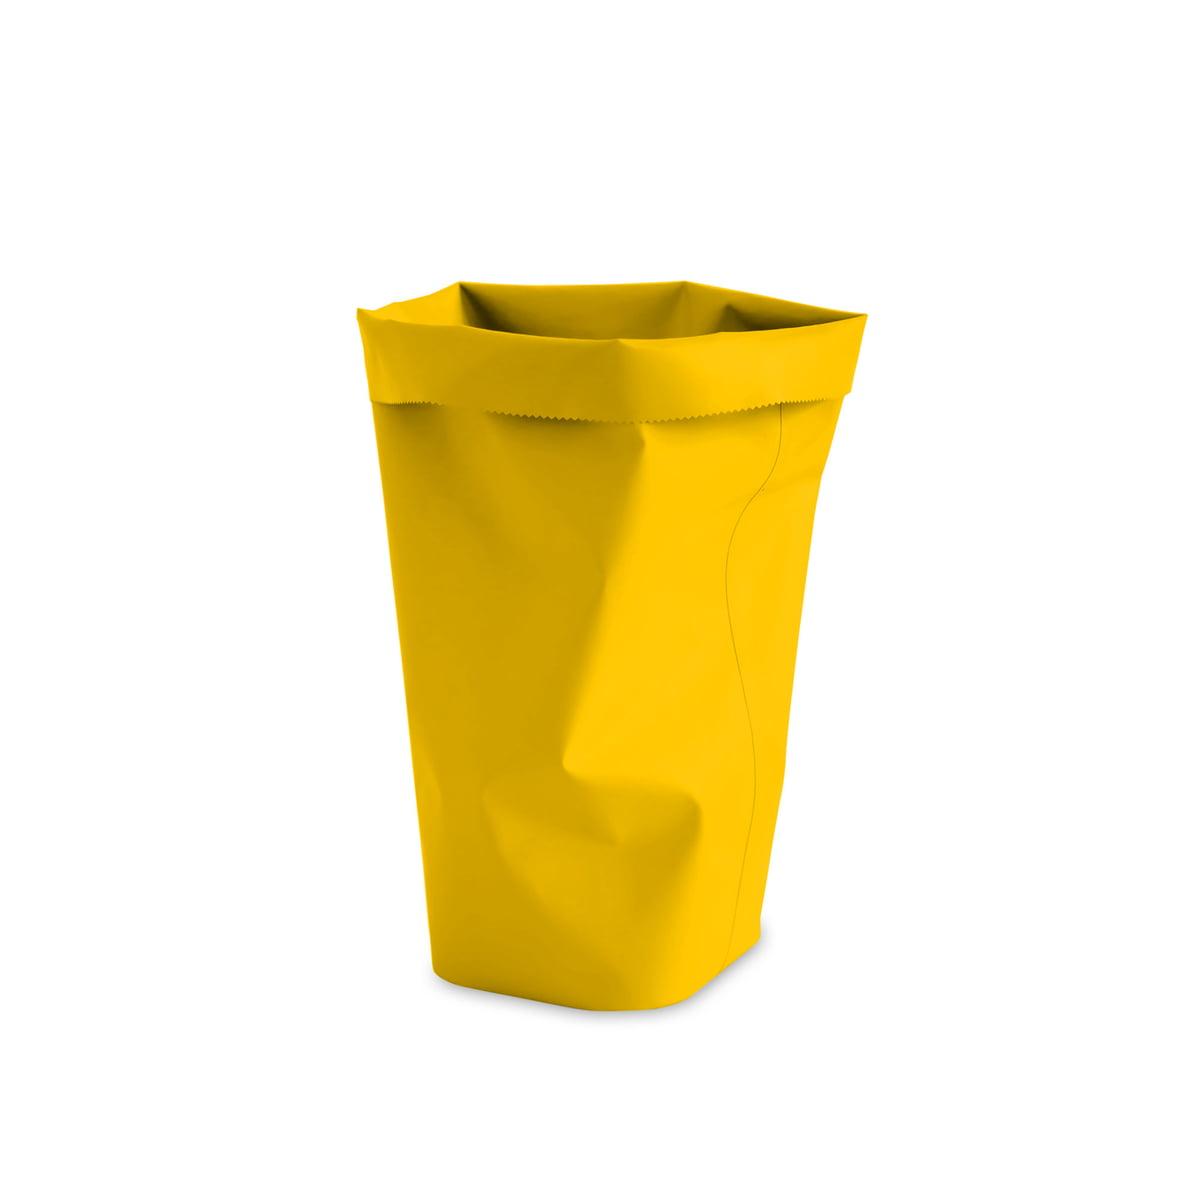 L&Z - Roll-Up Papierkorb M, zitrone   Büro > Papierkörbe   Zitronengelb   Tpu (100 % pvc-frei)   L&Z